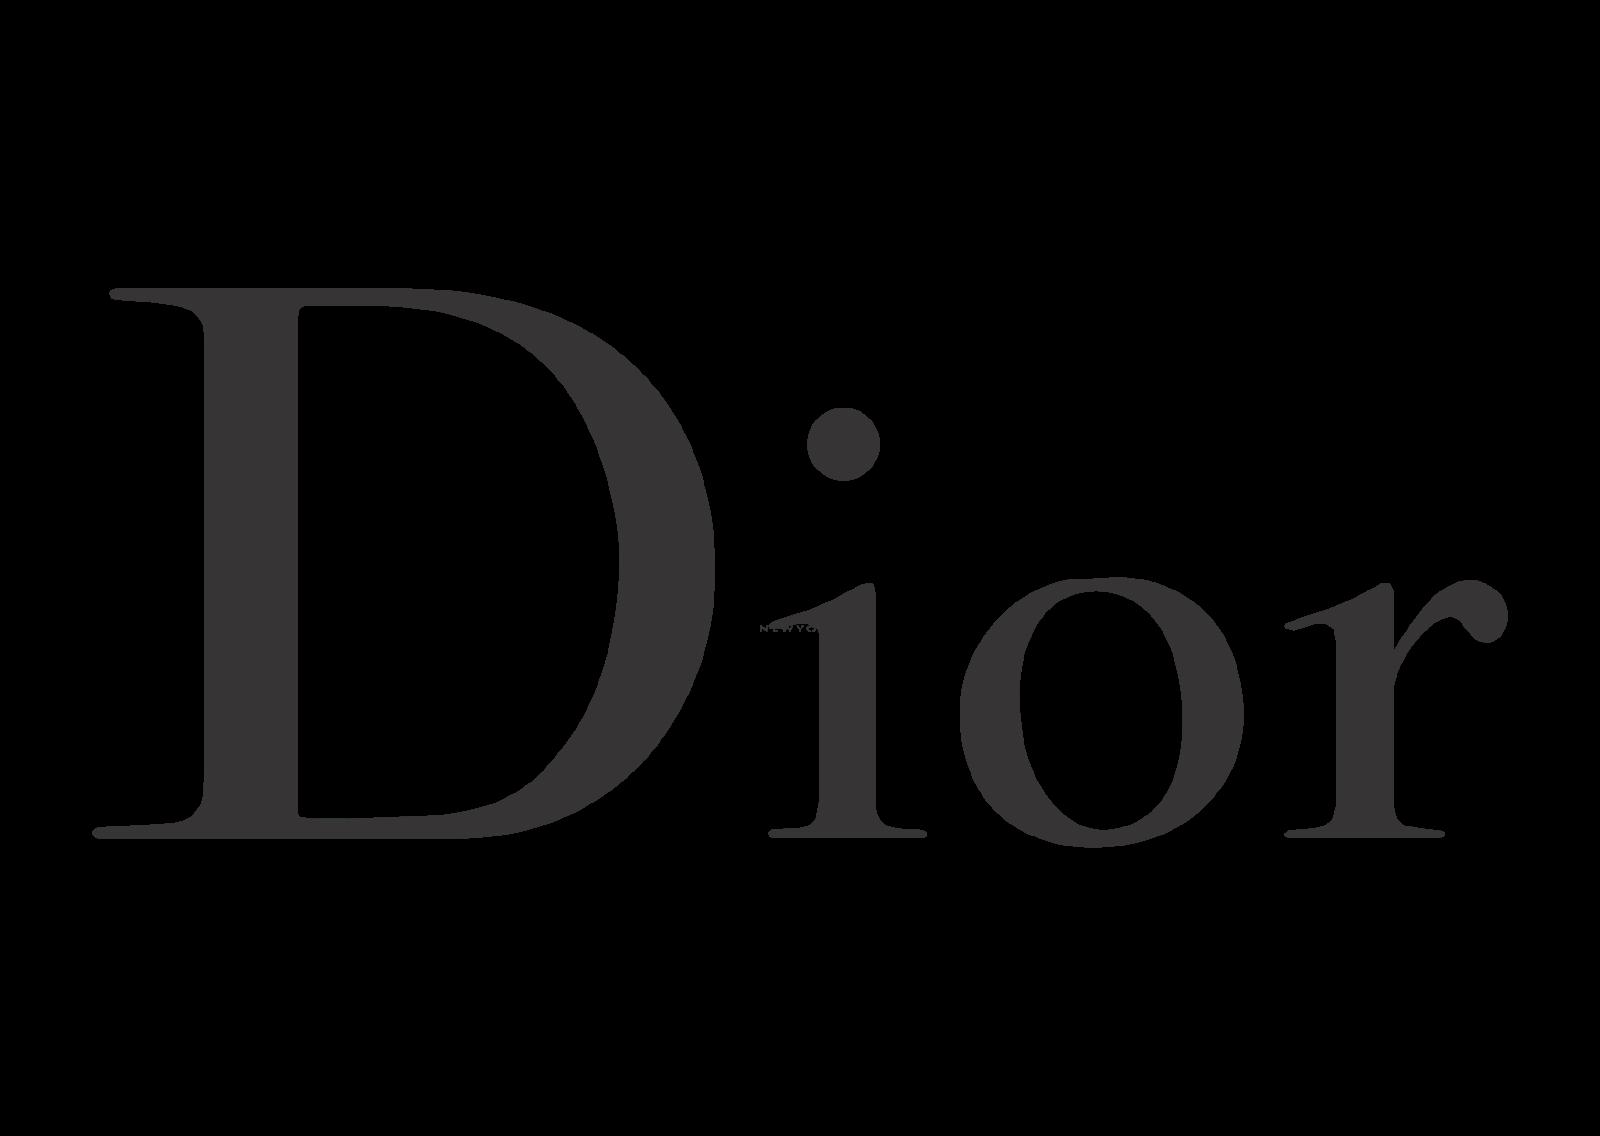 Dior Logo Vector. Fashion PlusPng pluspng.com - Adio Clothing Logo Vector PNG - Adio Clothing Vector PNG